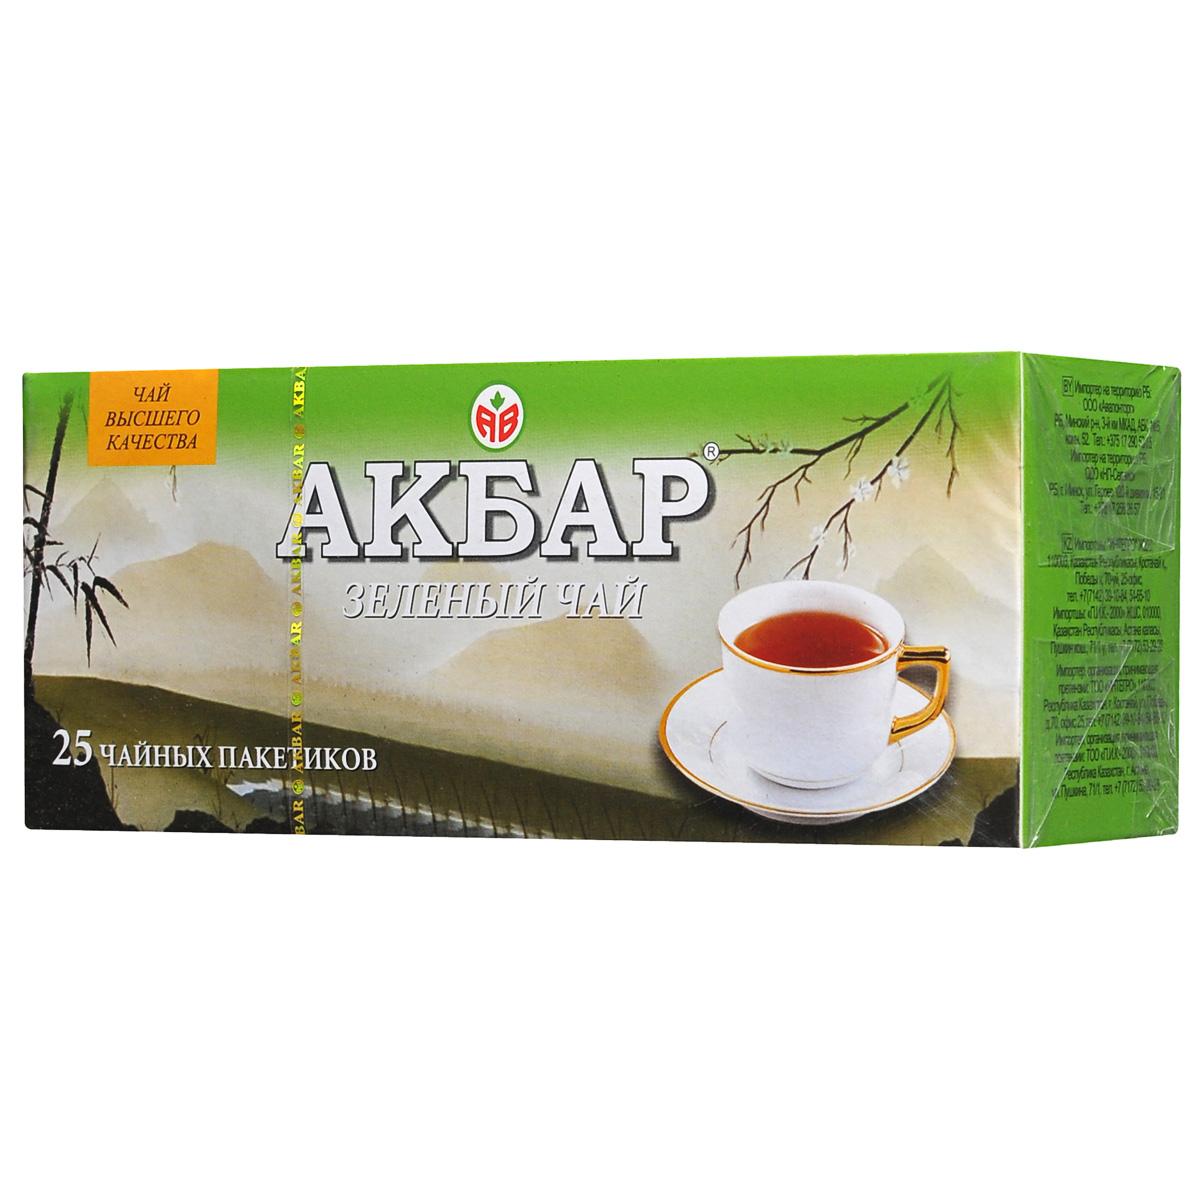 Akbar зеленый чай в пакетиках, 25 шт